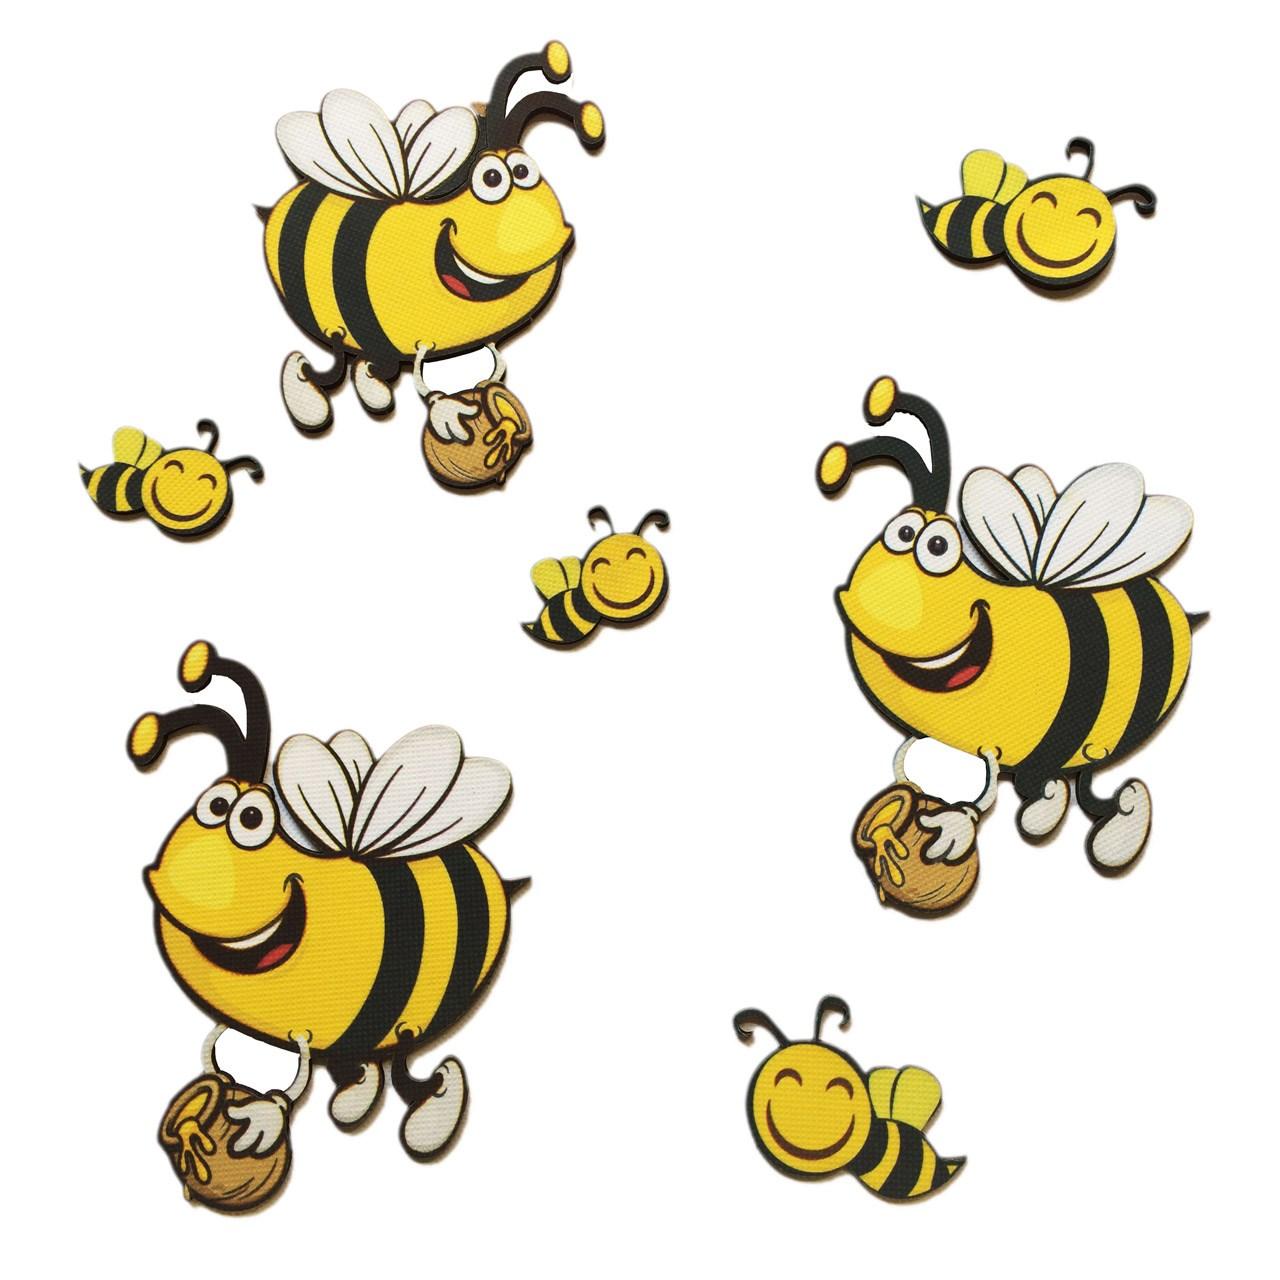 استیکر چوبی جیک جیک مدل کاراکتر زنبورها